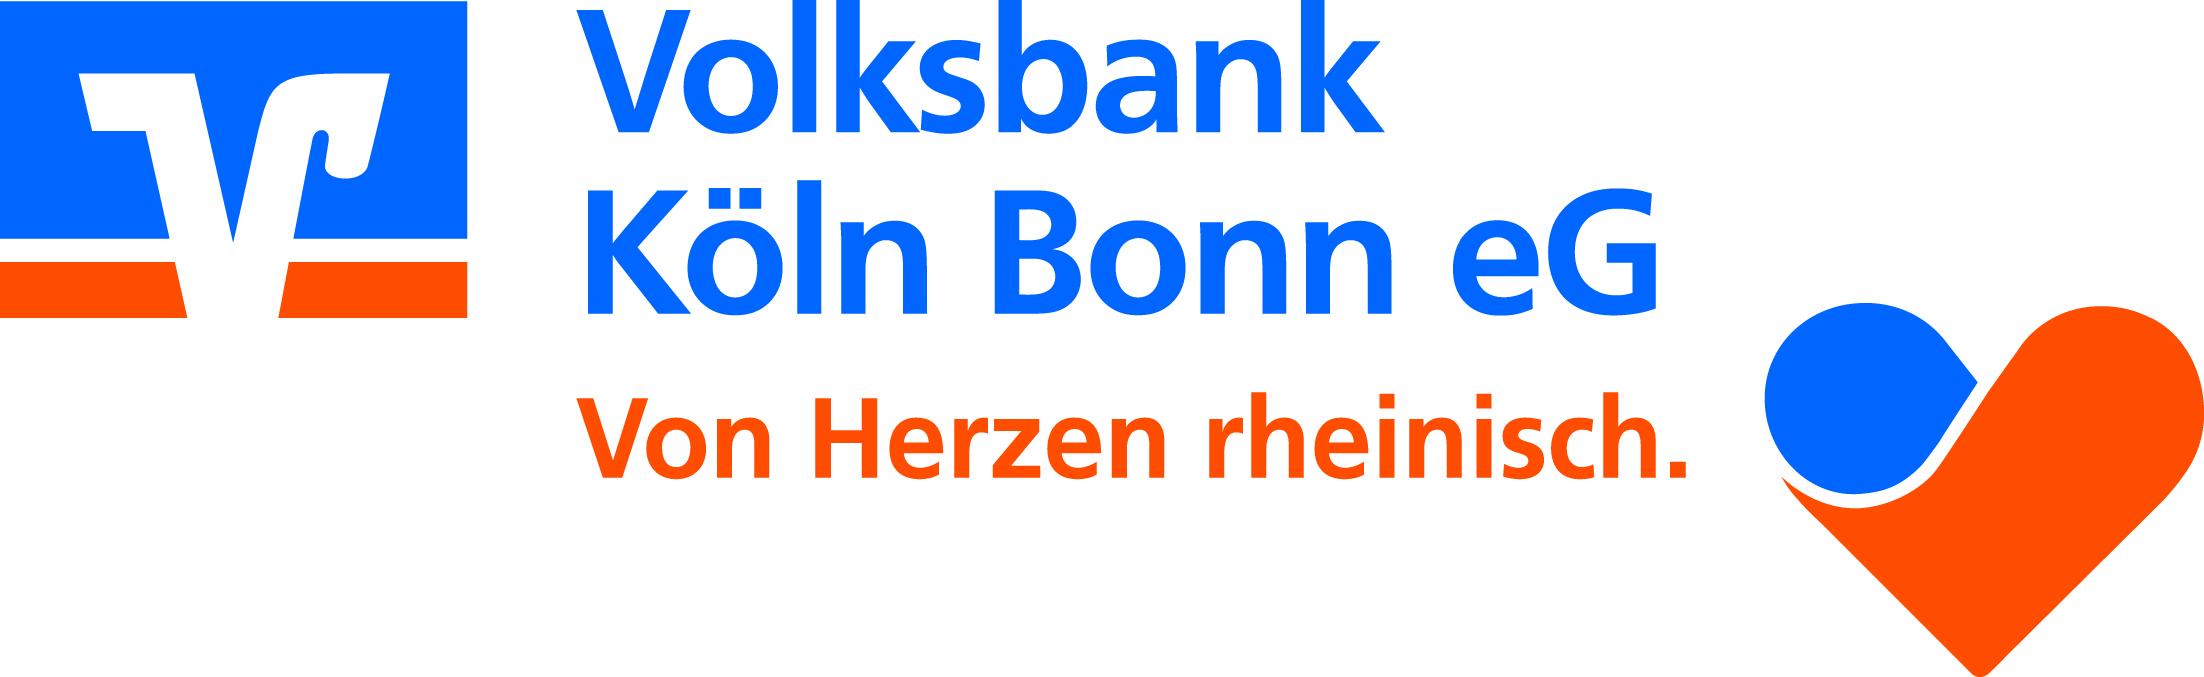 Logo Volksbank Köln Bonn zweizeilig 4c jpg